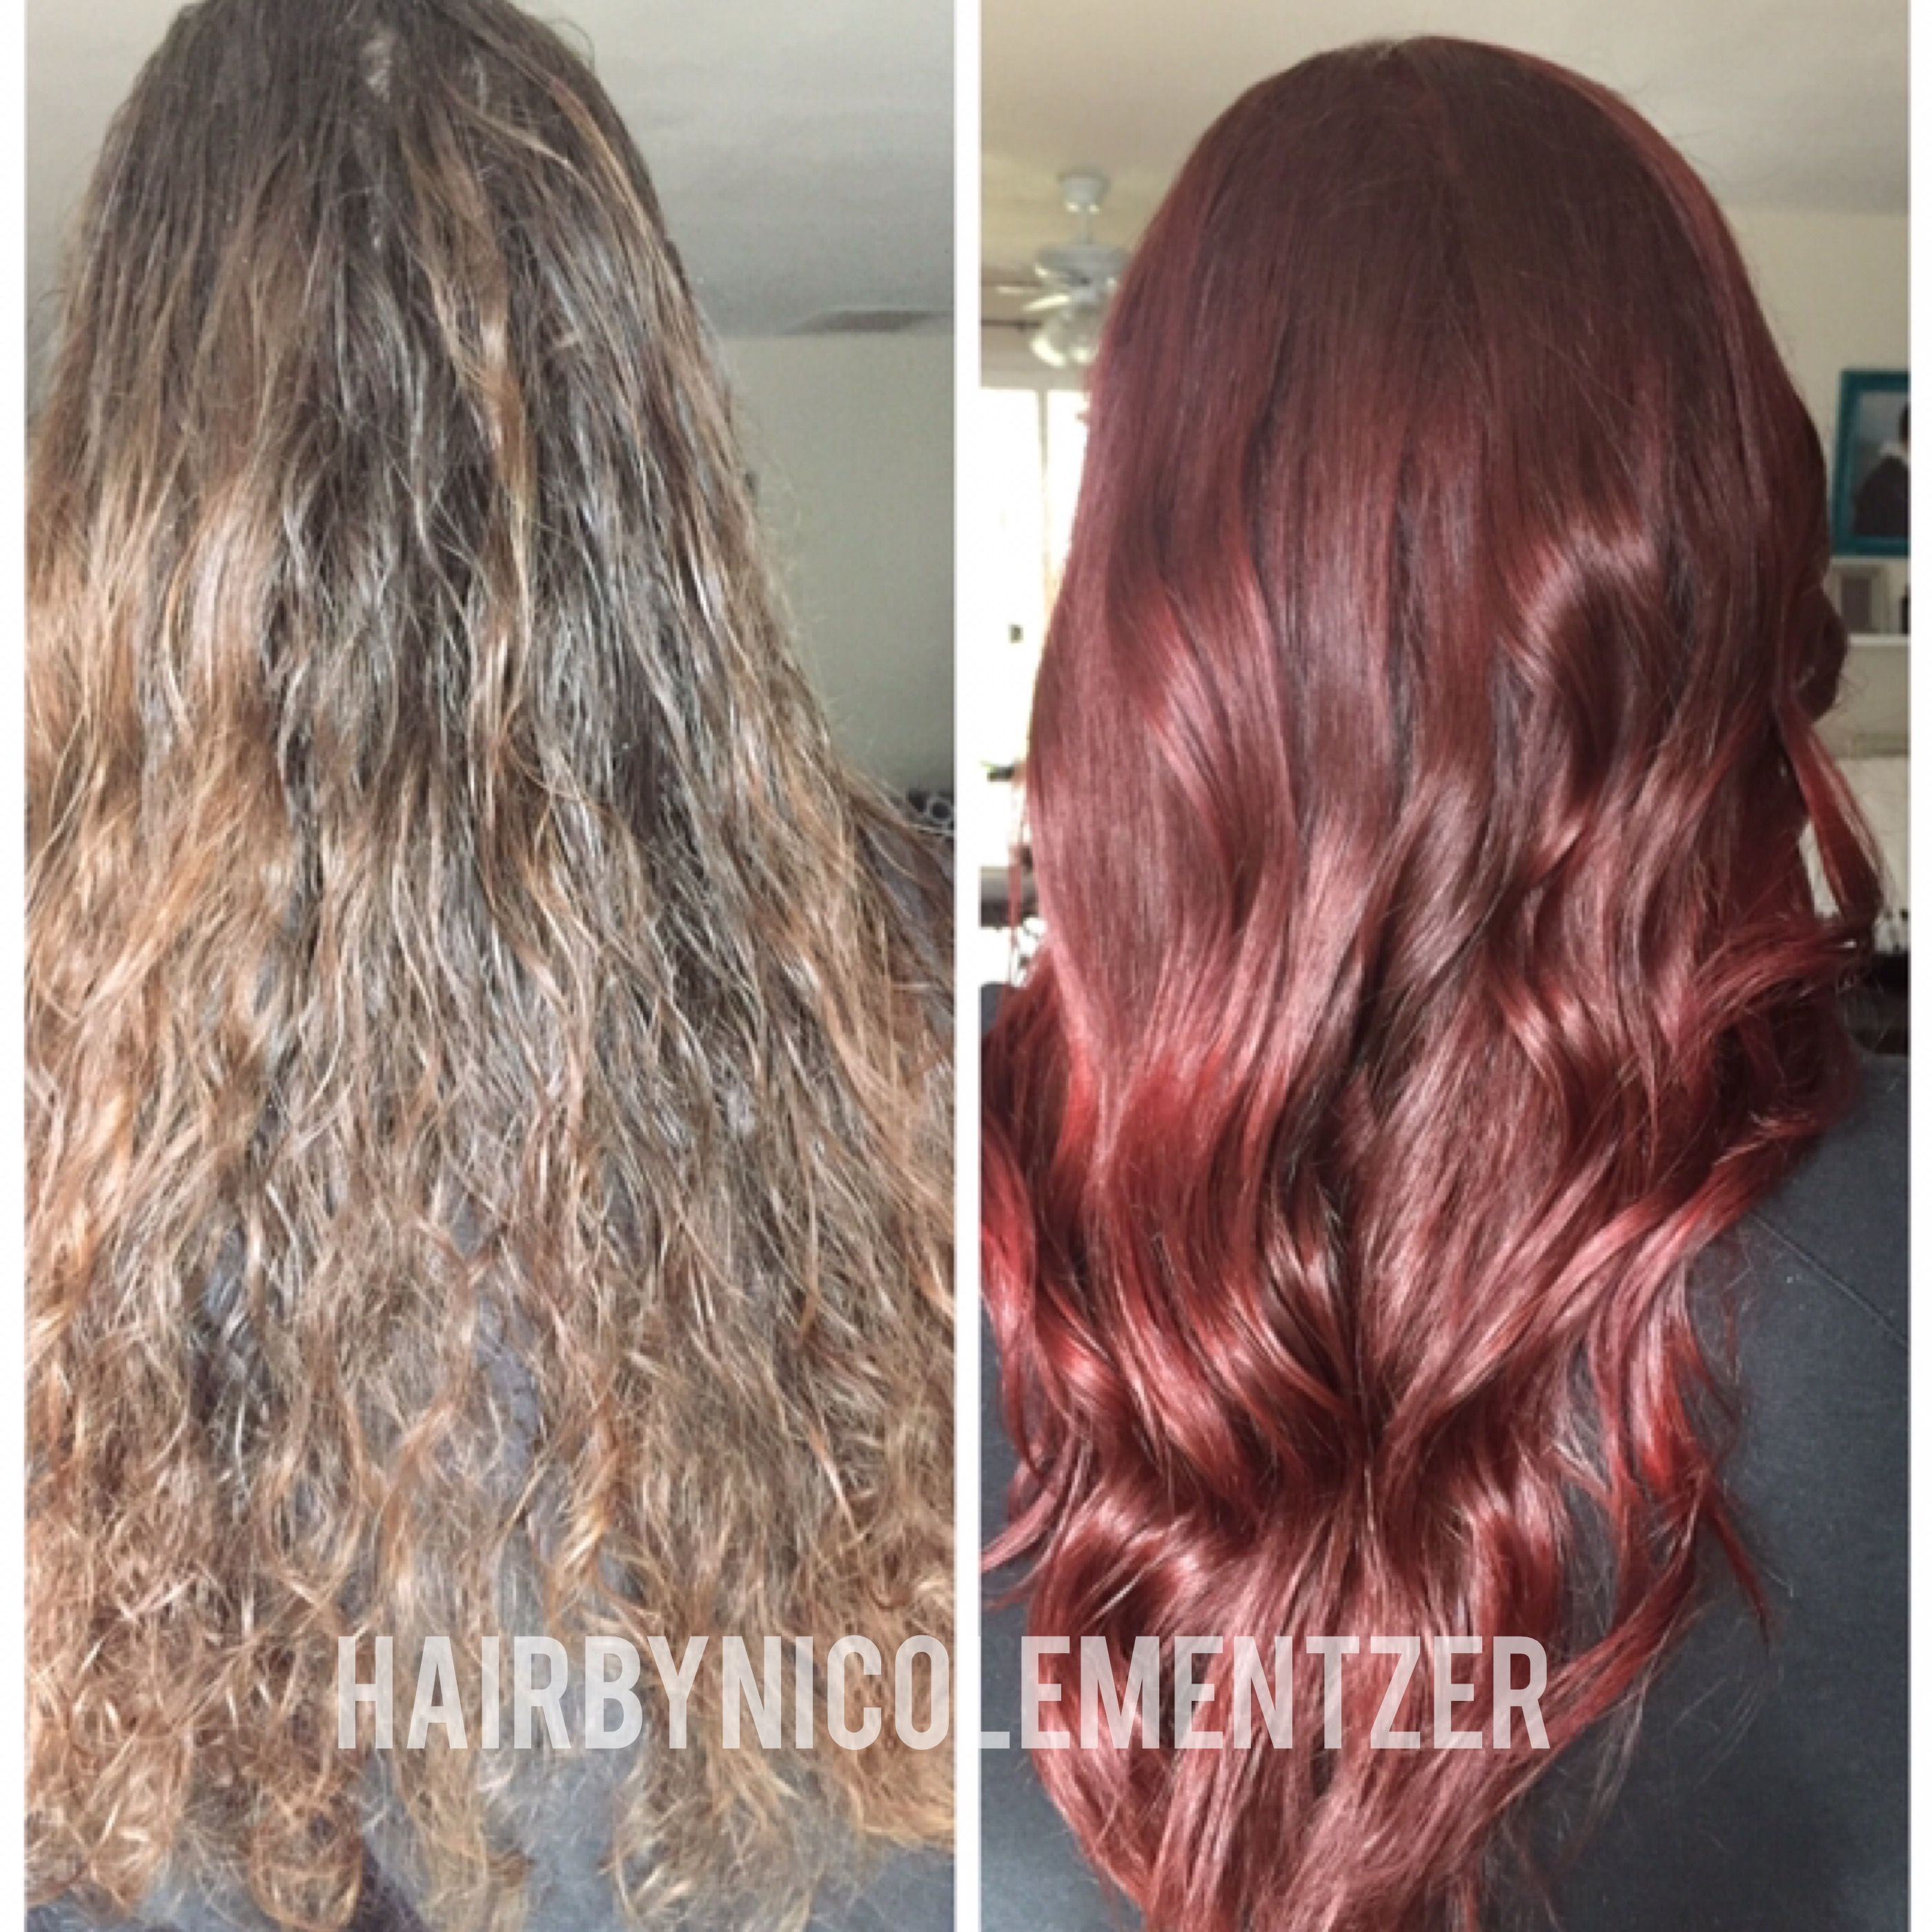 Red hair transformation redhairredhaircolorredheadbeforeandafter